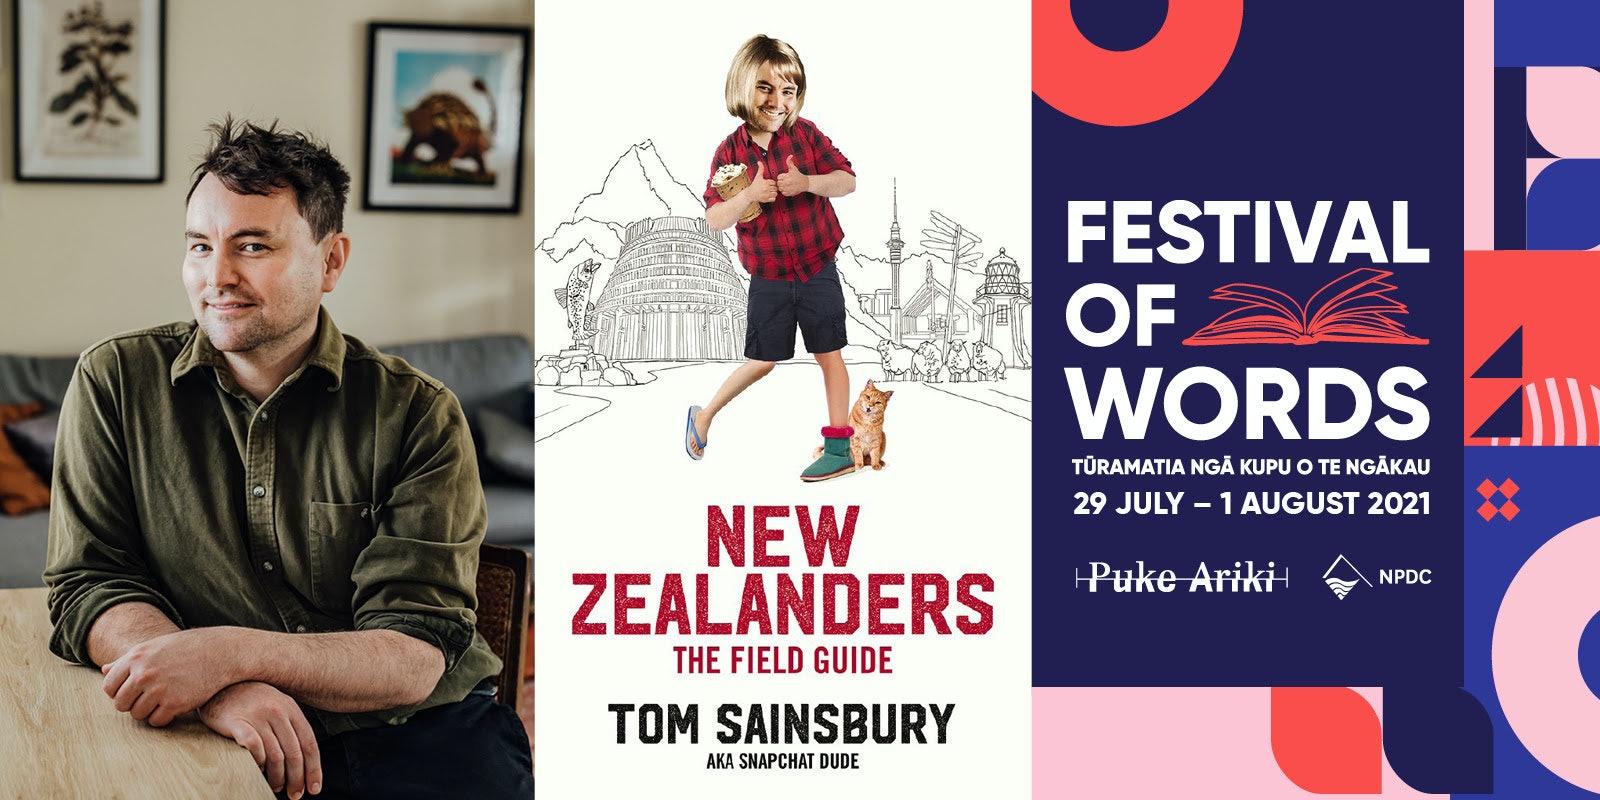 Tom Sainsbury - New  Zealanders: The Field Guide